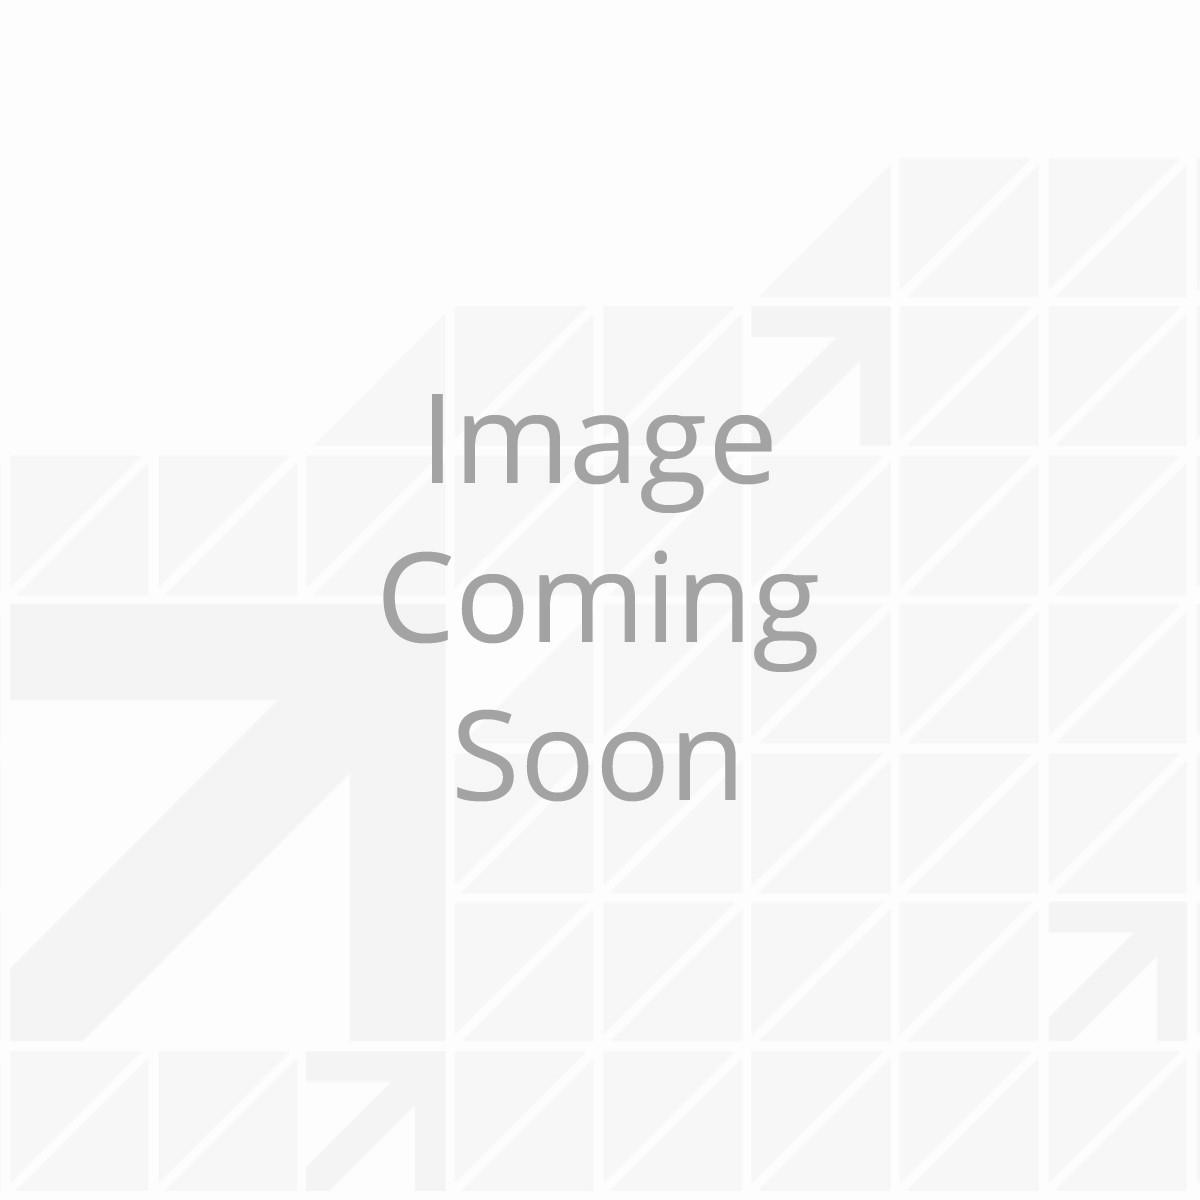 Lead Leg Assembly (Landing Gear) - Various Options